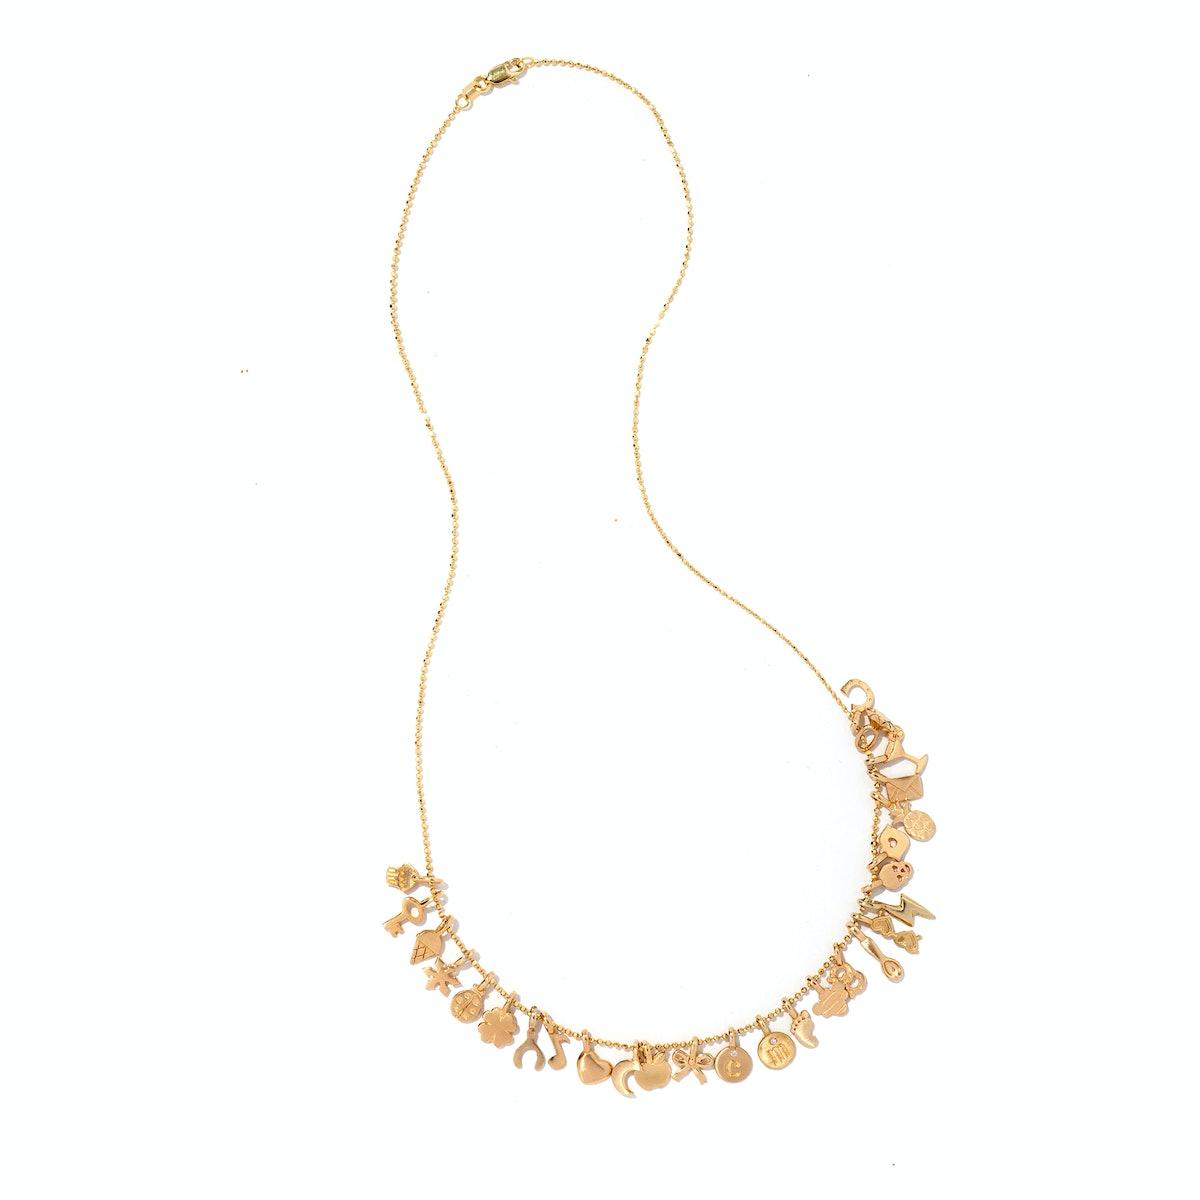 Alex-Woo-charm-necklace